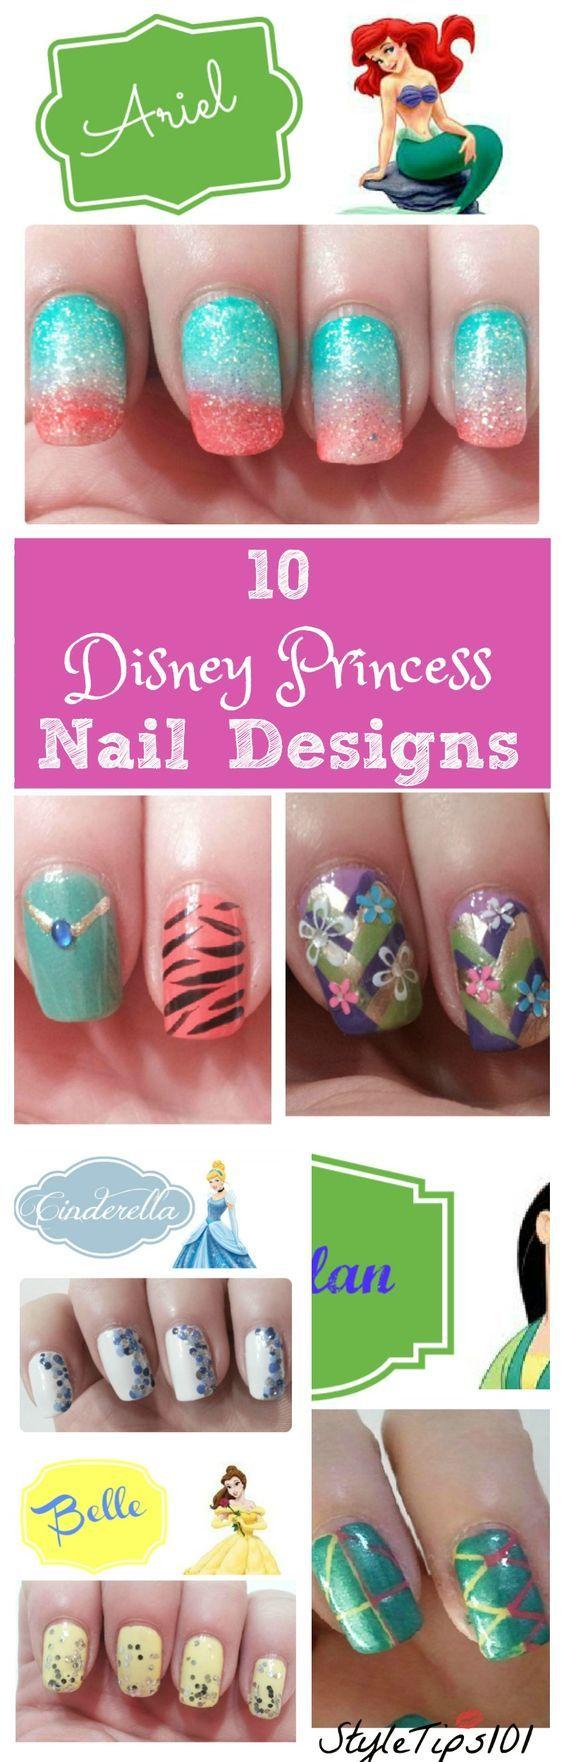 Disney Princess Nail Designs